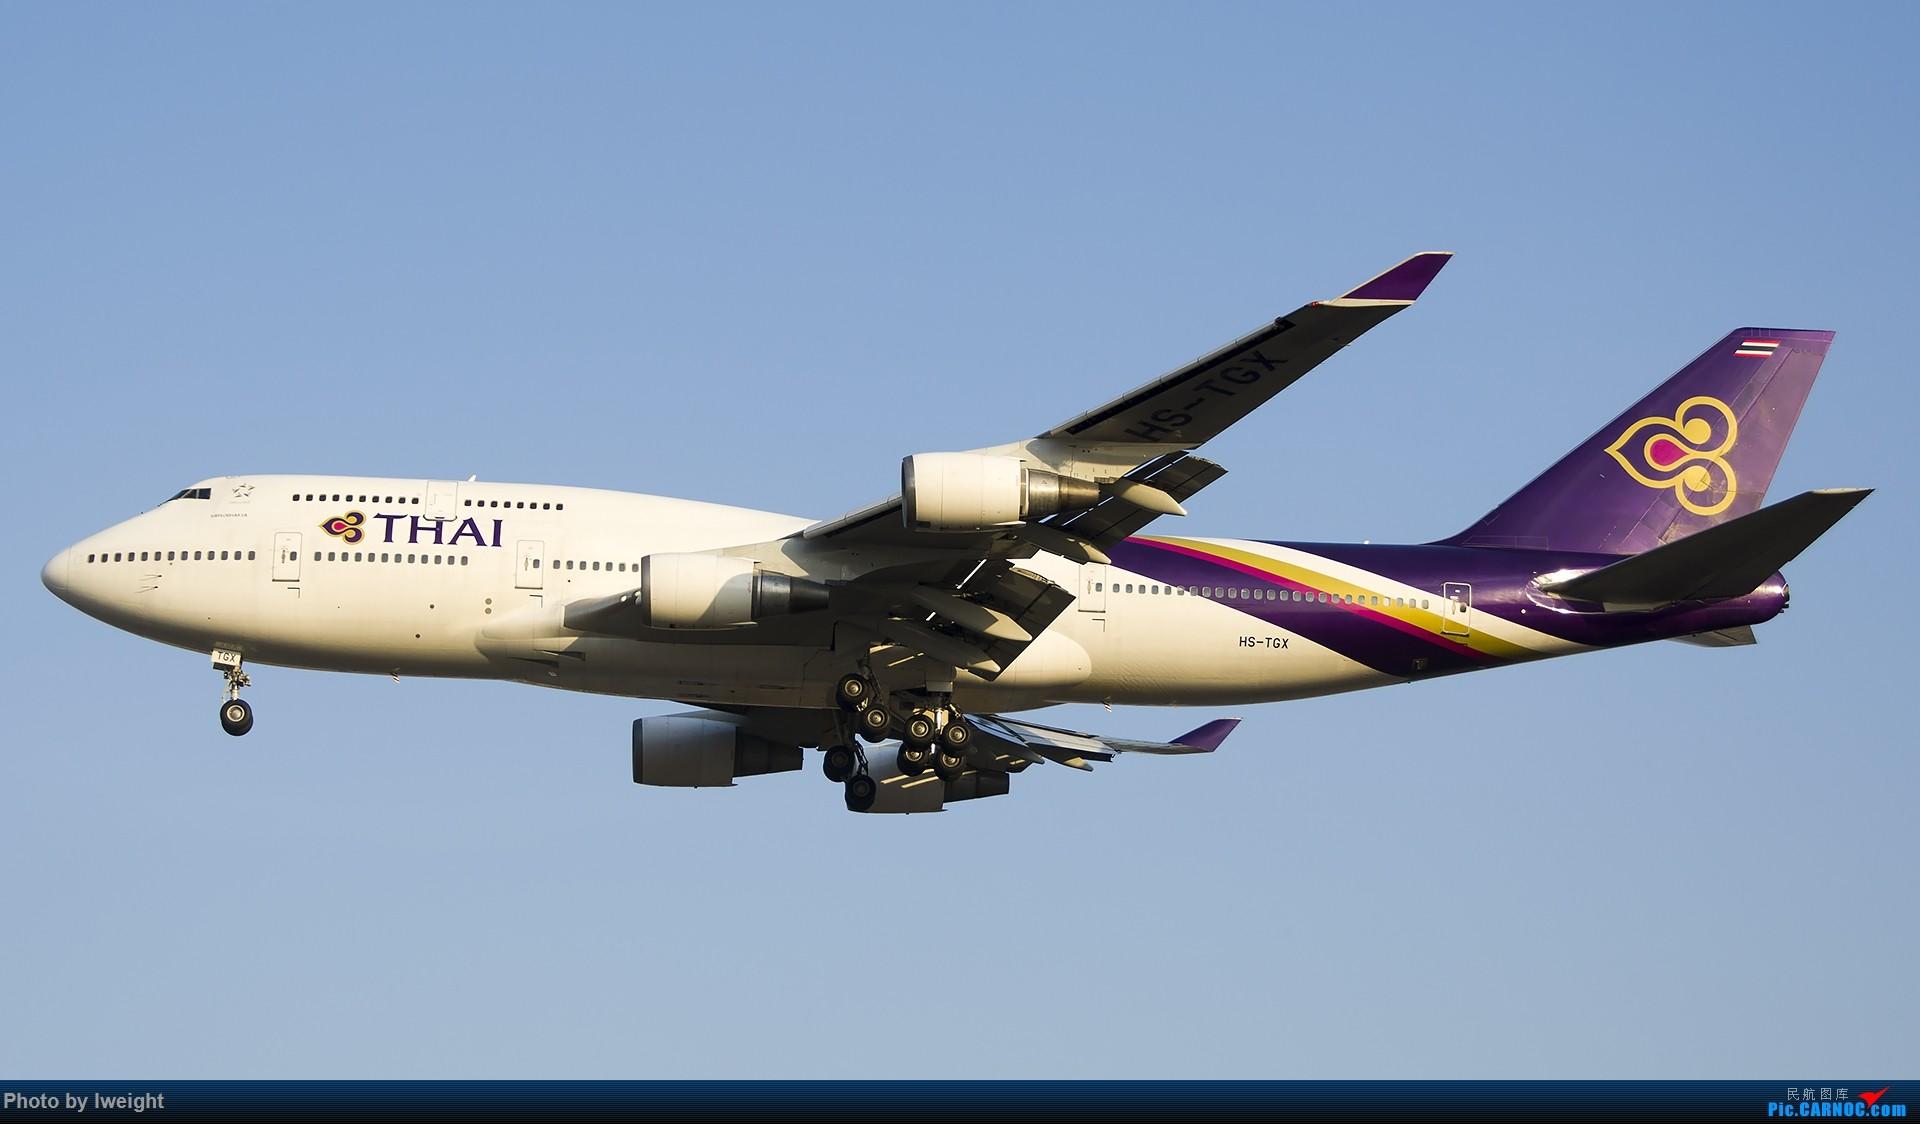 Re:[原创]庆祝升级777,发上今天在首都机场拍的所有飞机【2014-12-14】 BOEING 747-400 HS-TGX 中国北京首都国际机场